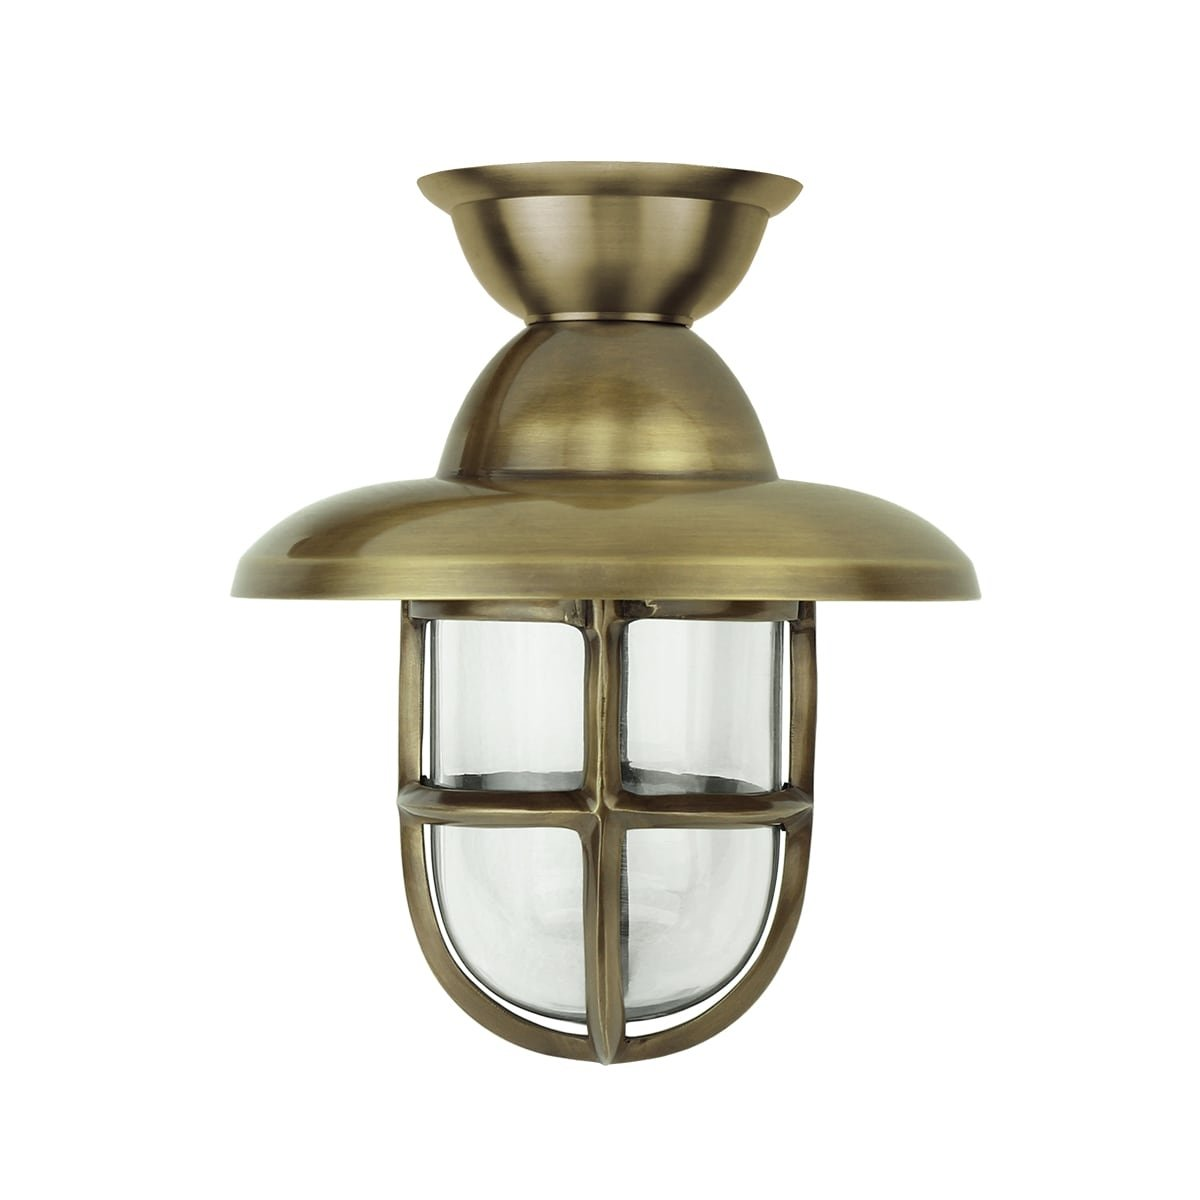 Outdoor lighting Maritime nautical Ship lamp Marine brass - 28 cm